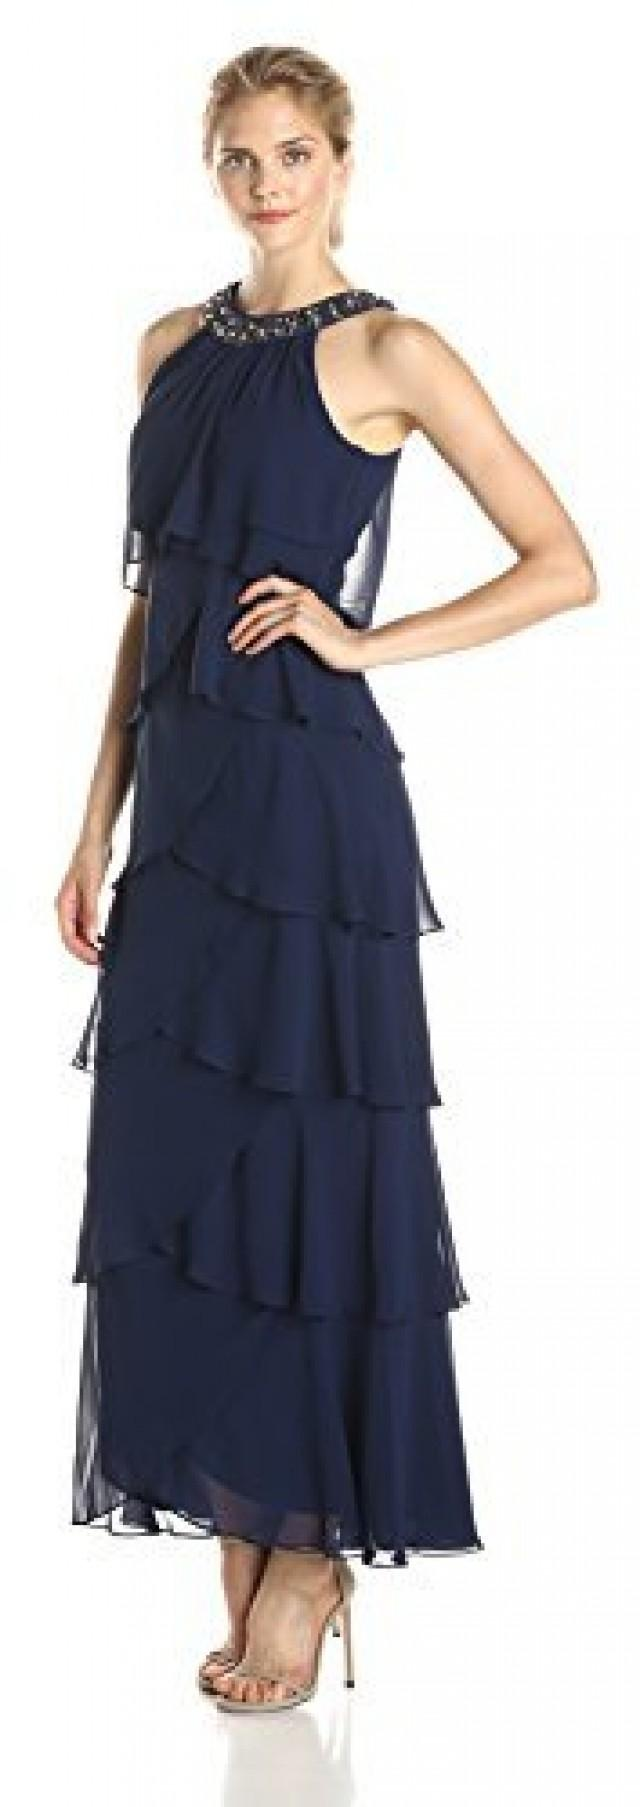 Sl sl fashion dresses - S L Fashions Women S Beaded Neck Long Tiered Chiffon 2447256 Weddbook